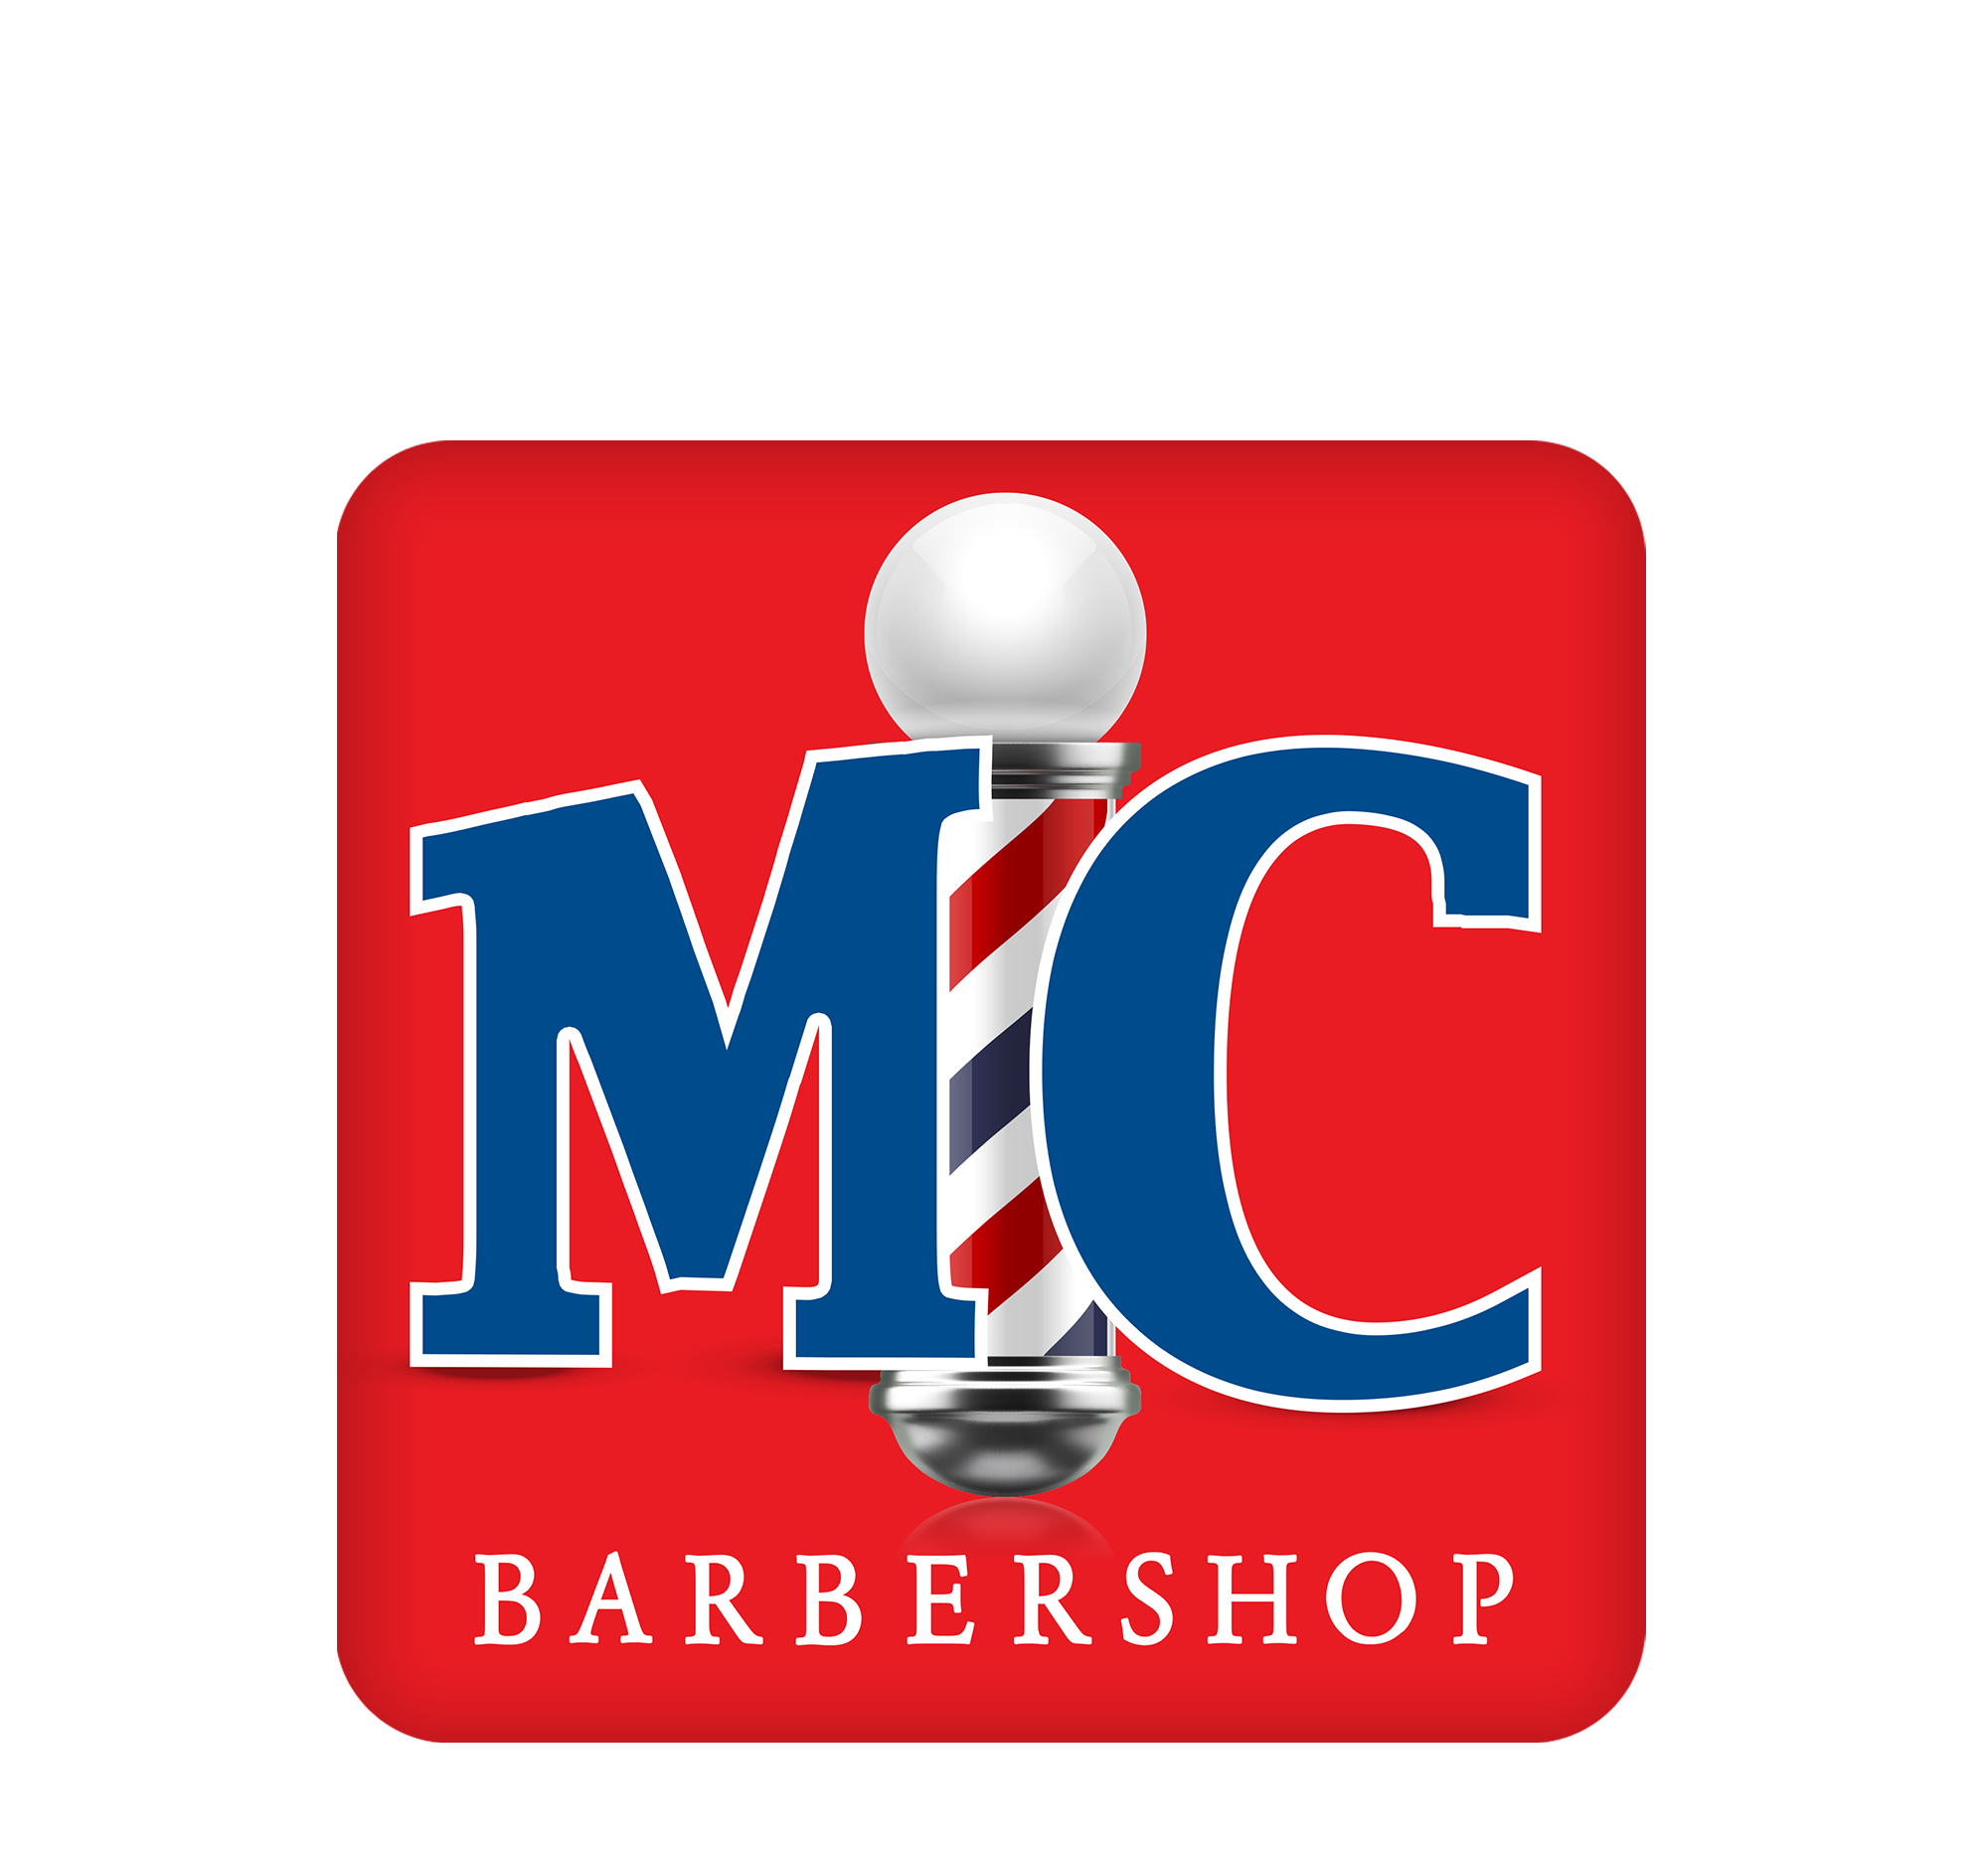 The Men S Club Barbershop